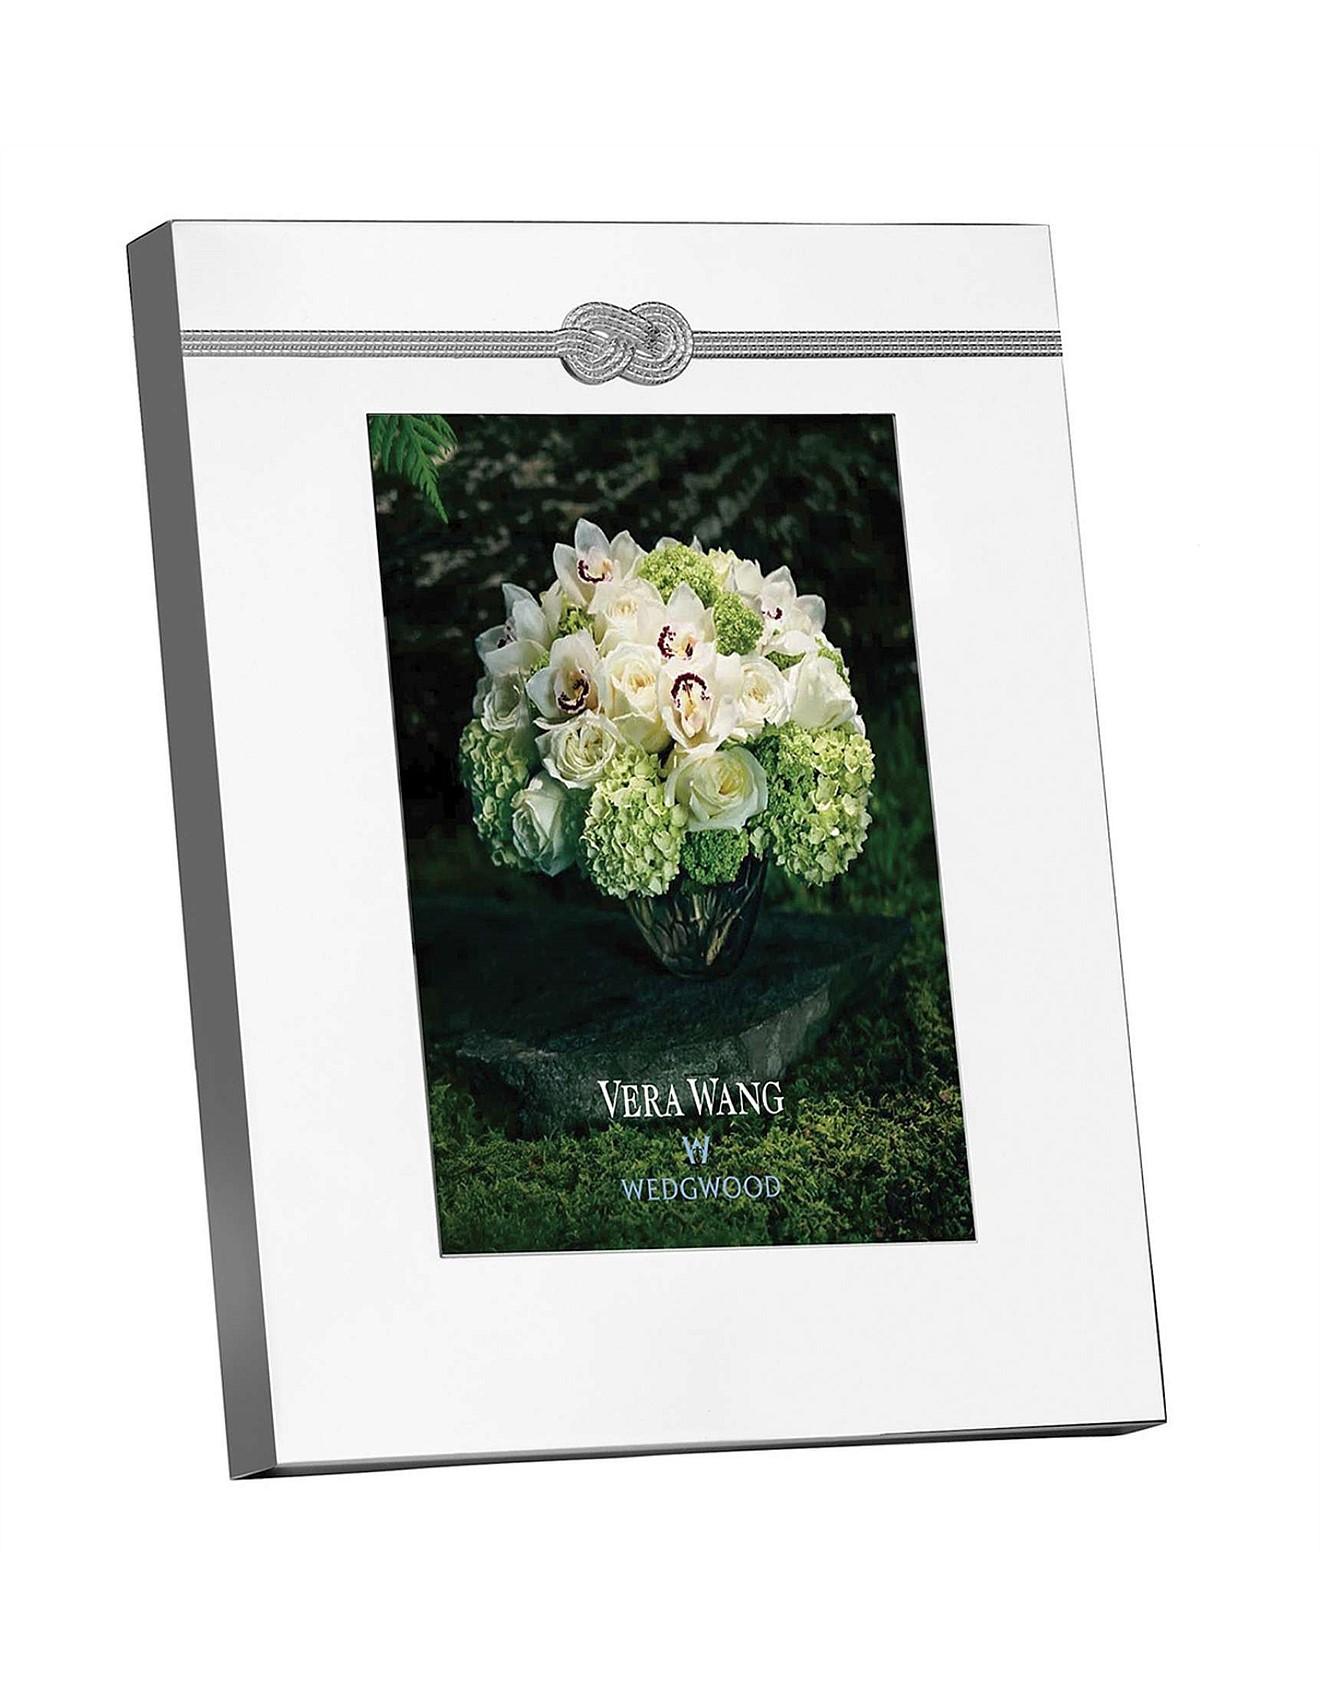 Wedding Engagement Gift Ideas David Jones Vera Wang Wedgwood